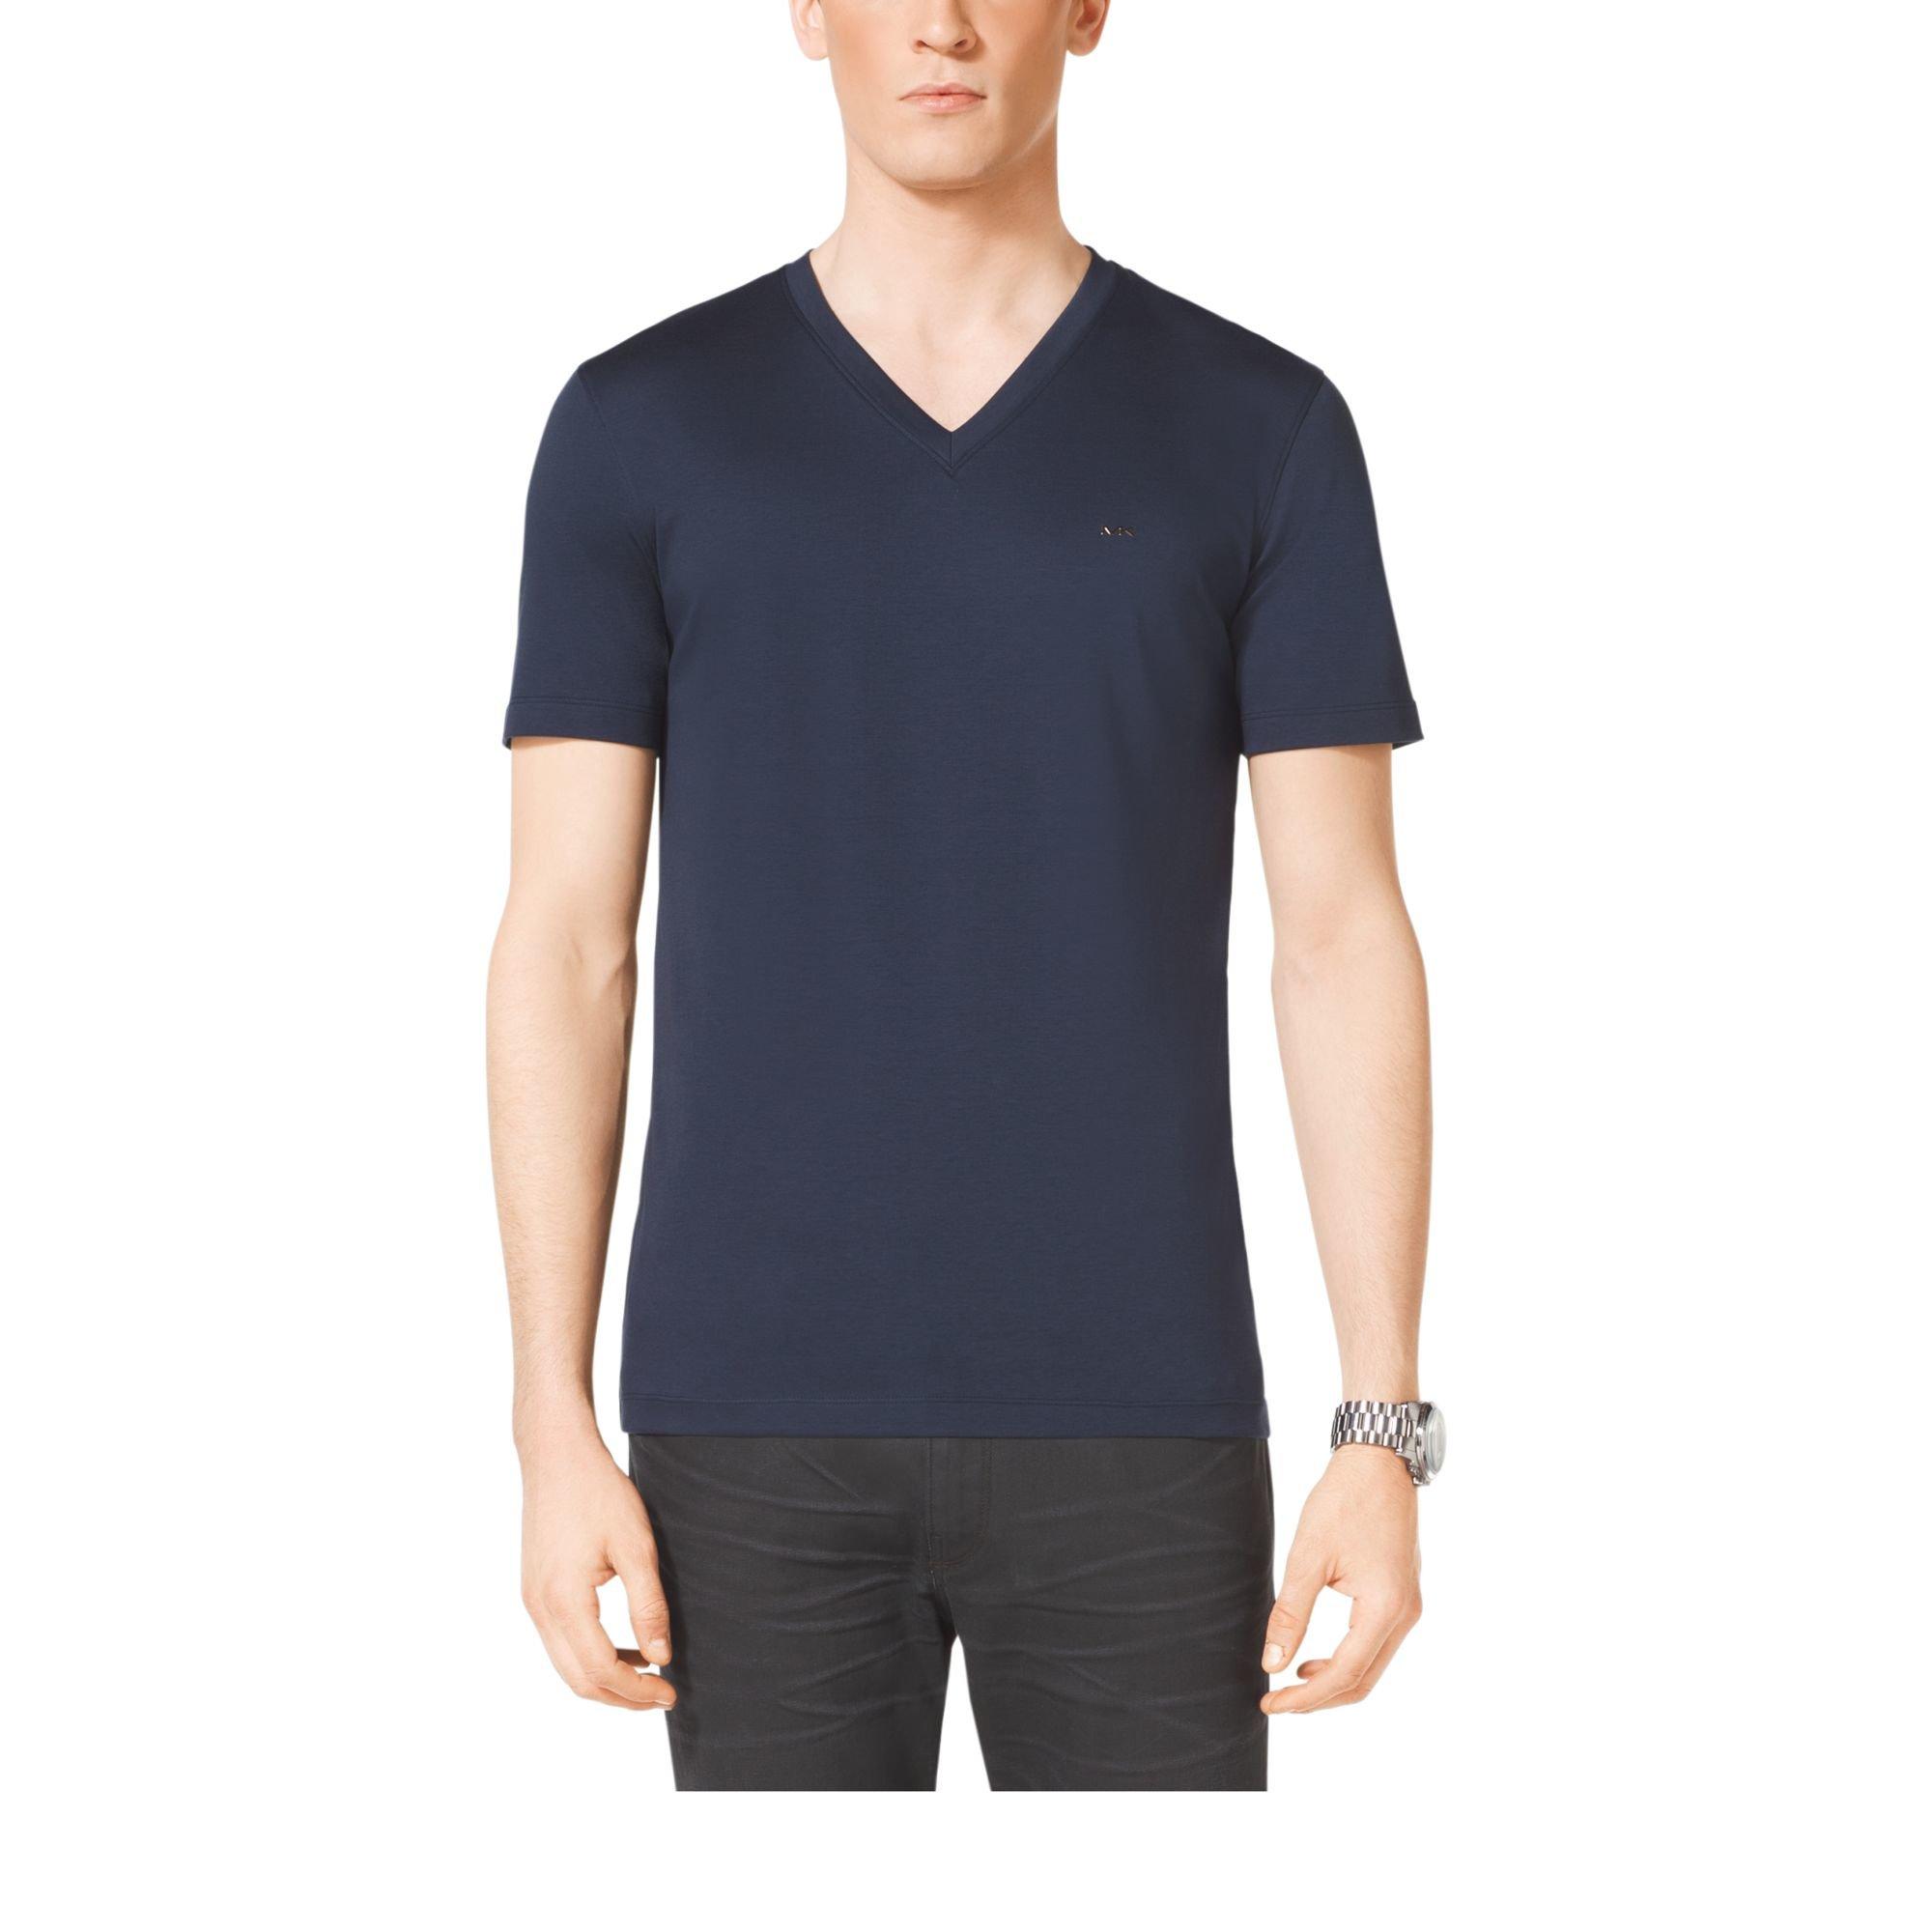 michael kors v neck cotton t shirt in blue for men midnight lyst. Black Bedroom Furniture Sets. Home Design Ideas